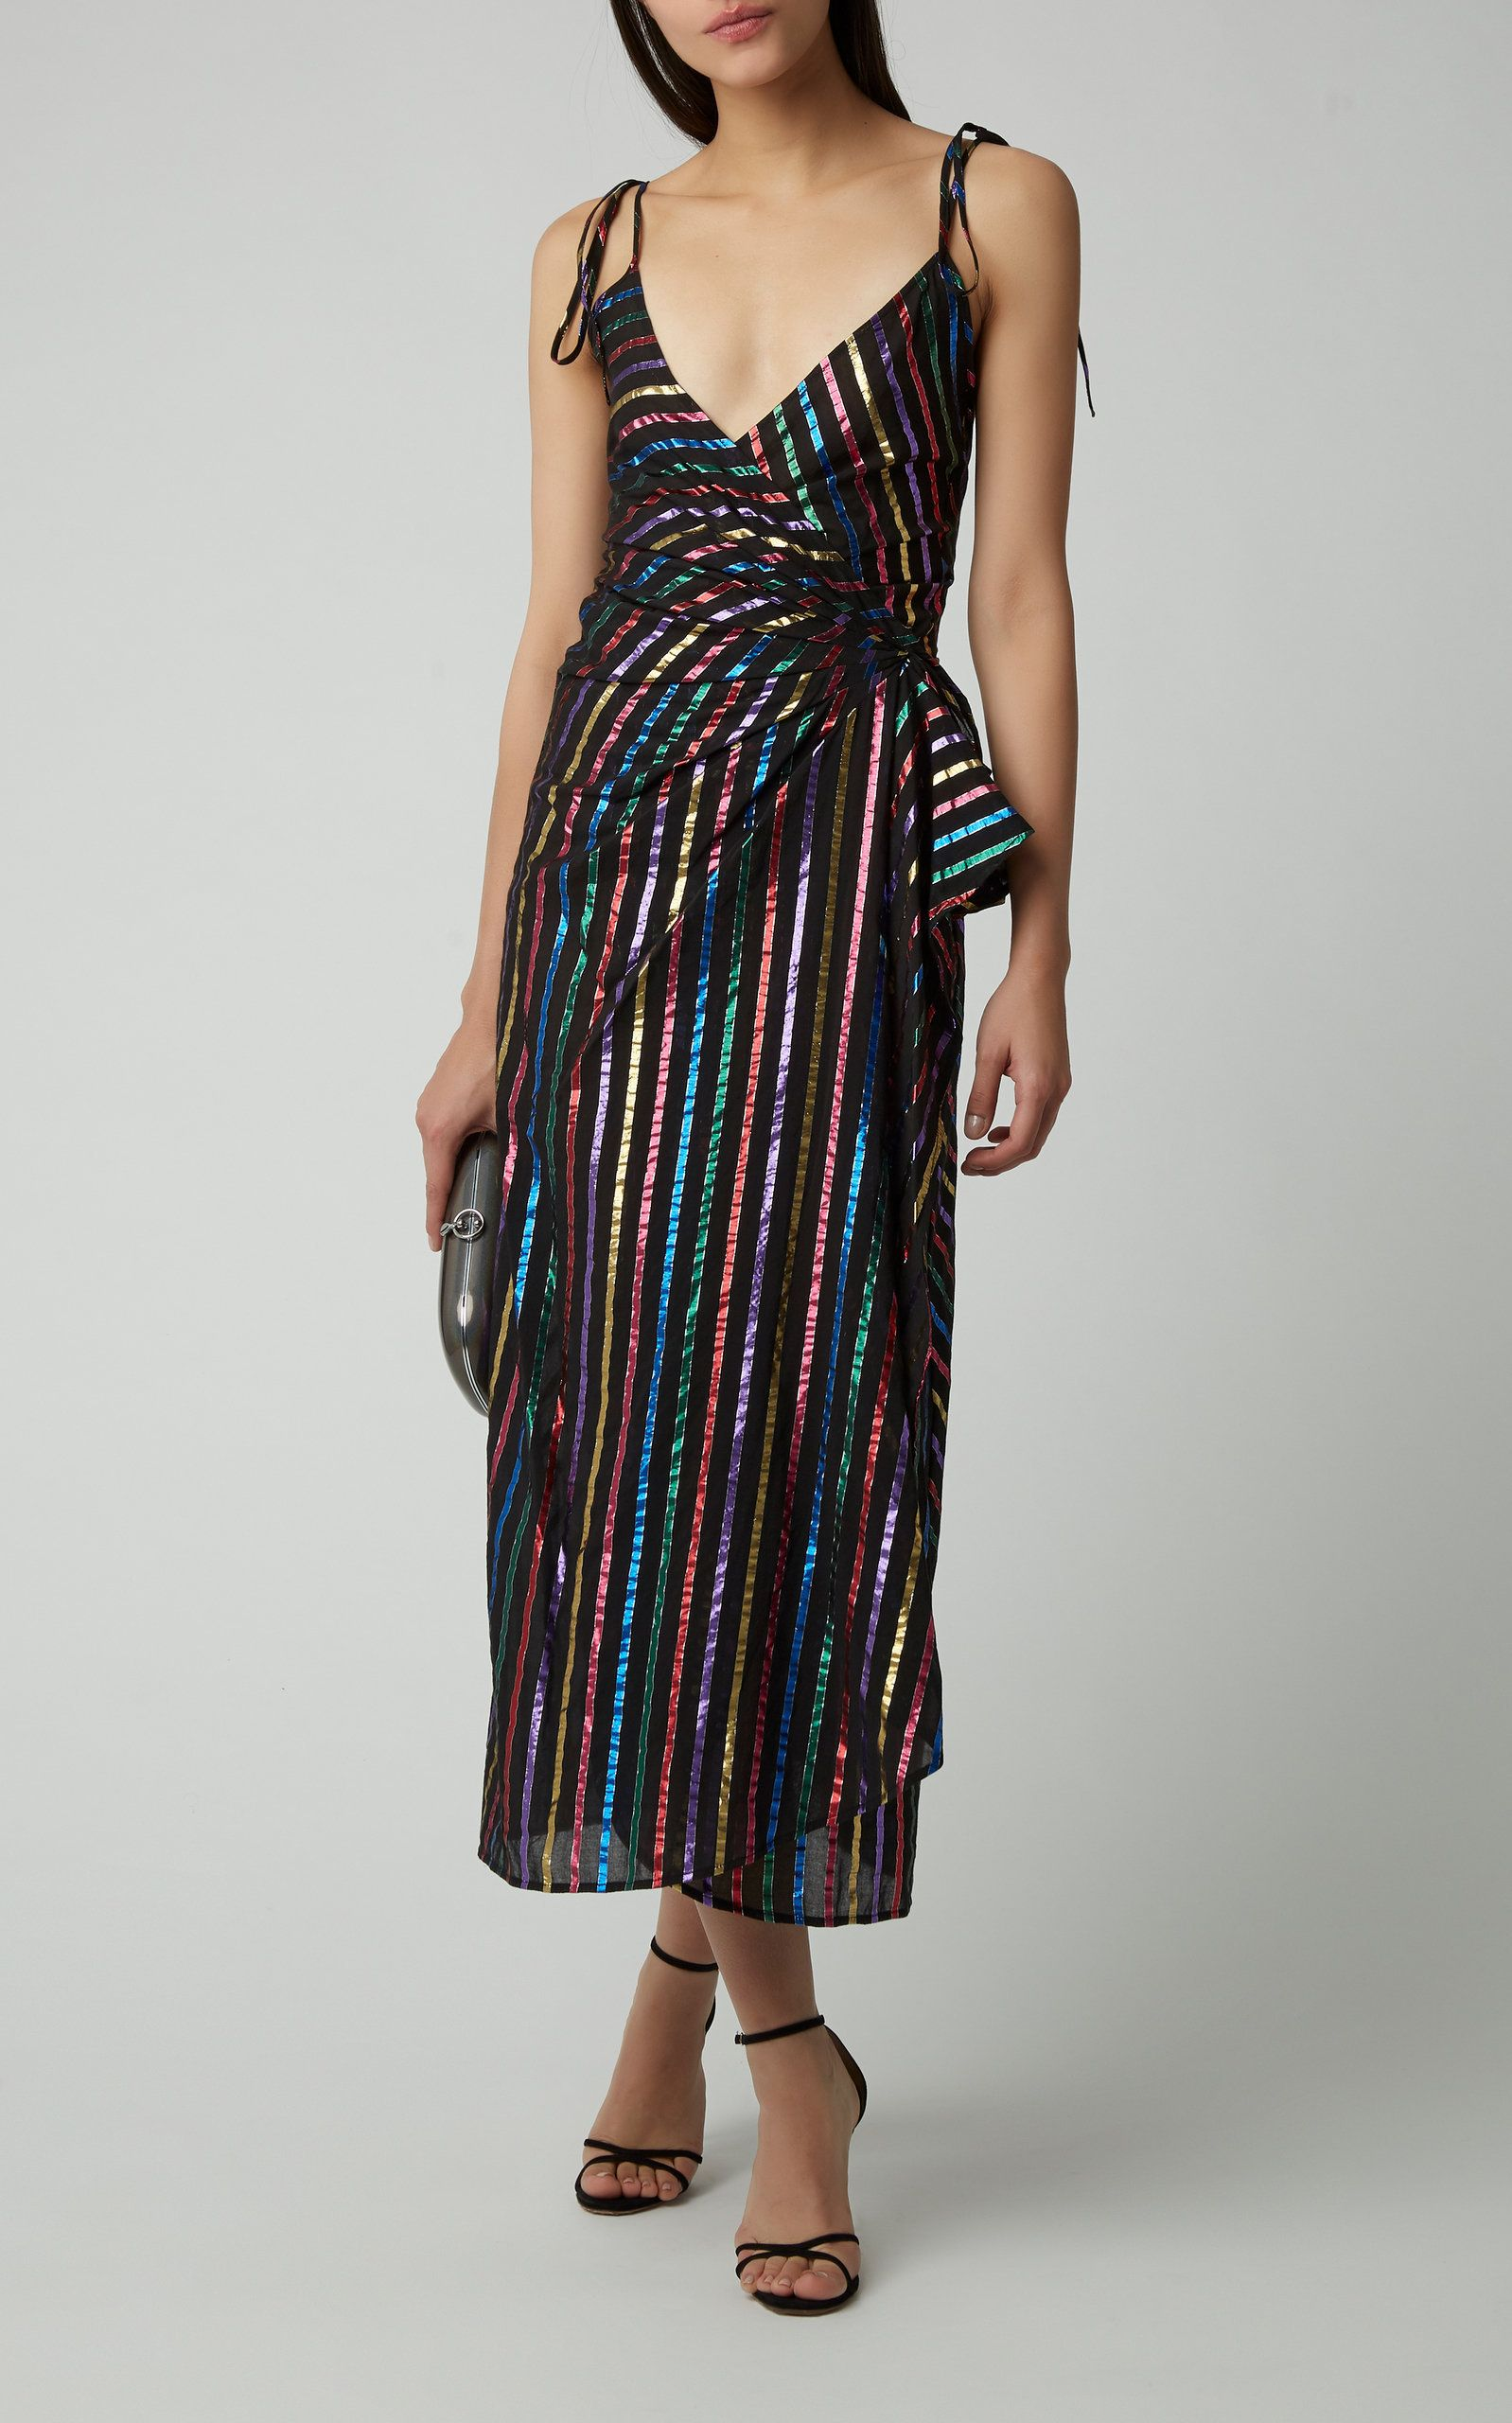 ac8d7e2800bfb Click product to zoom Silk Kimono, Bodice, Dress Outfits, Belt Tying,  Beautiful